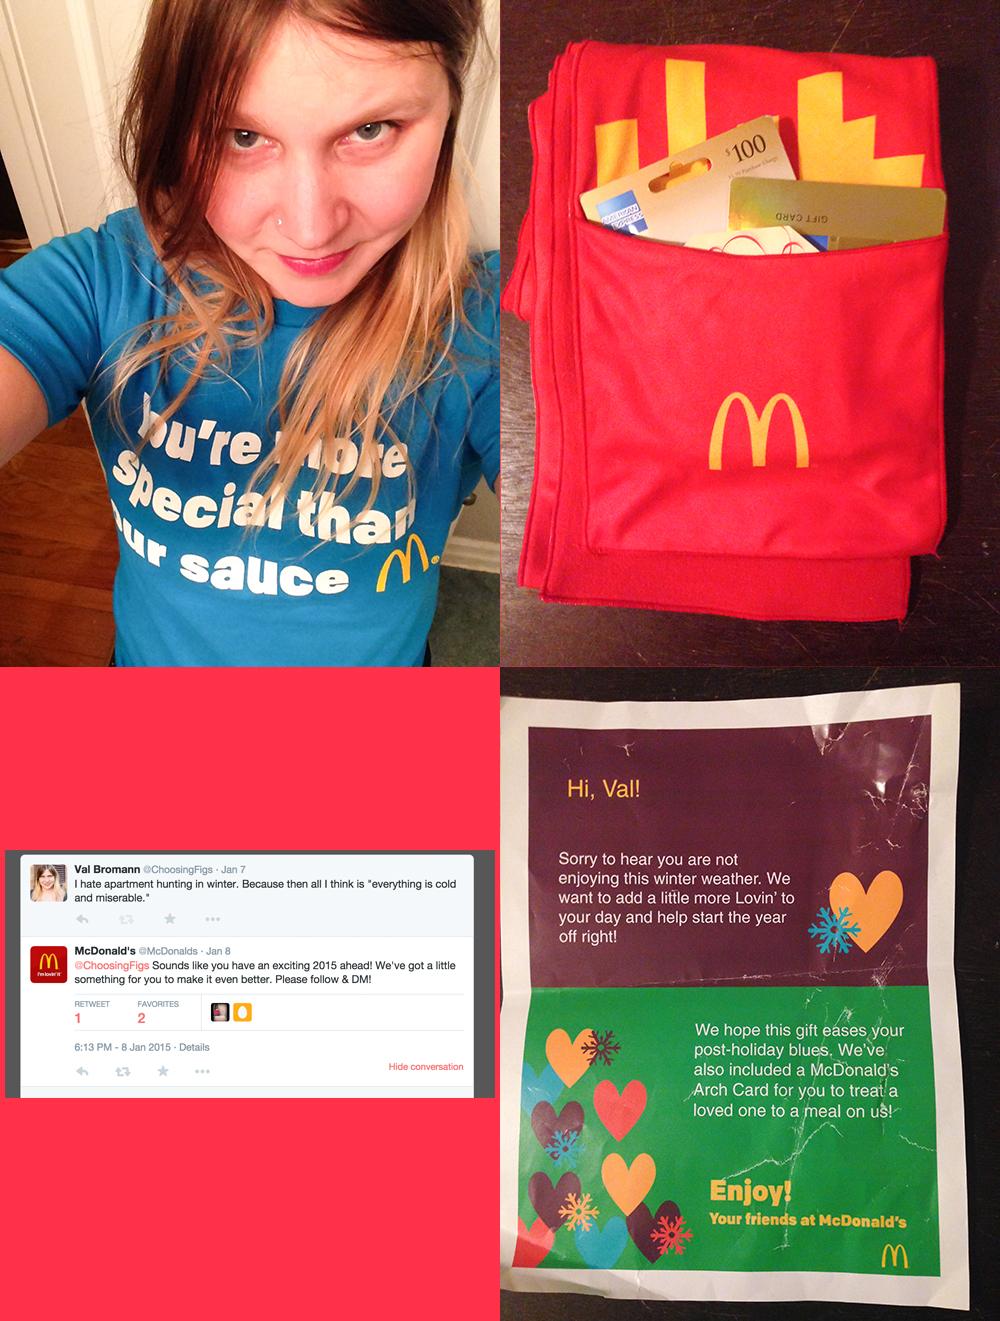 McDonalds Swag